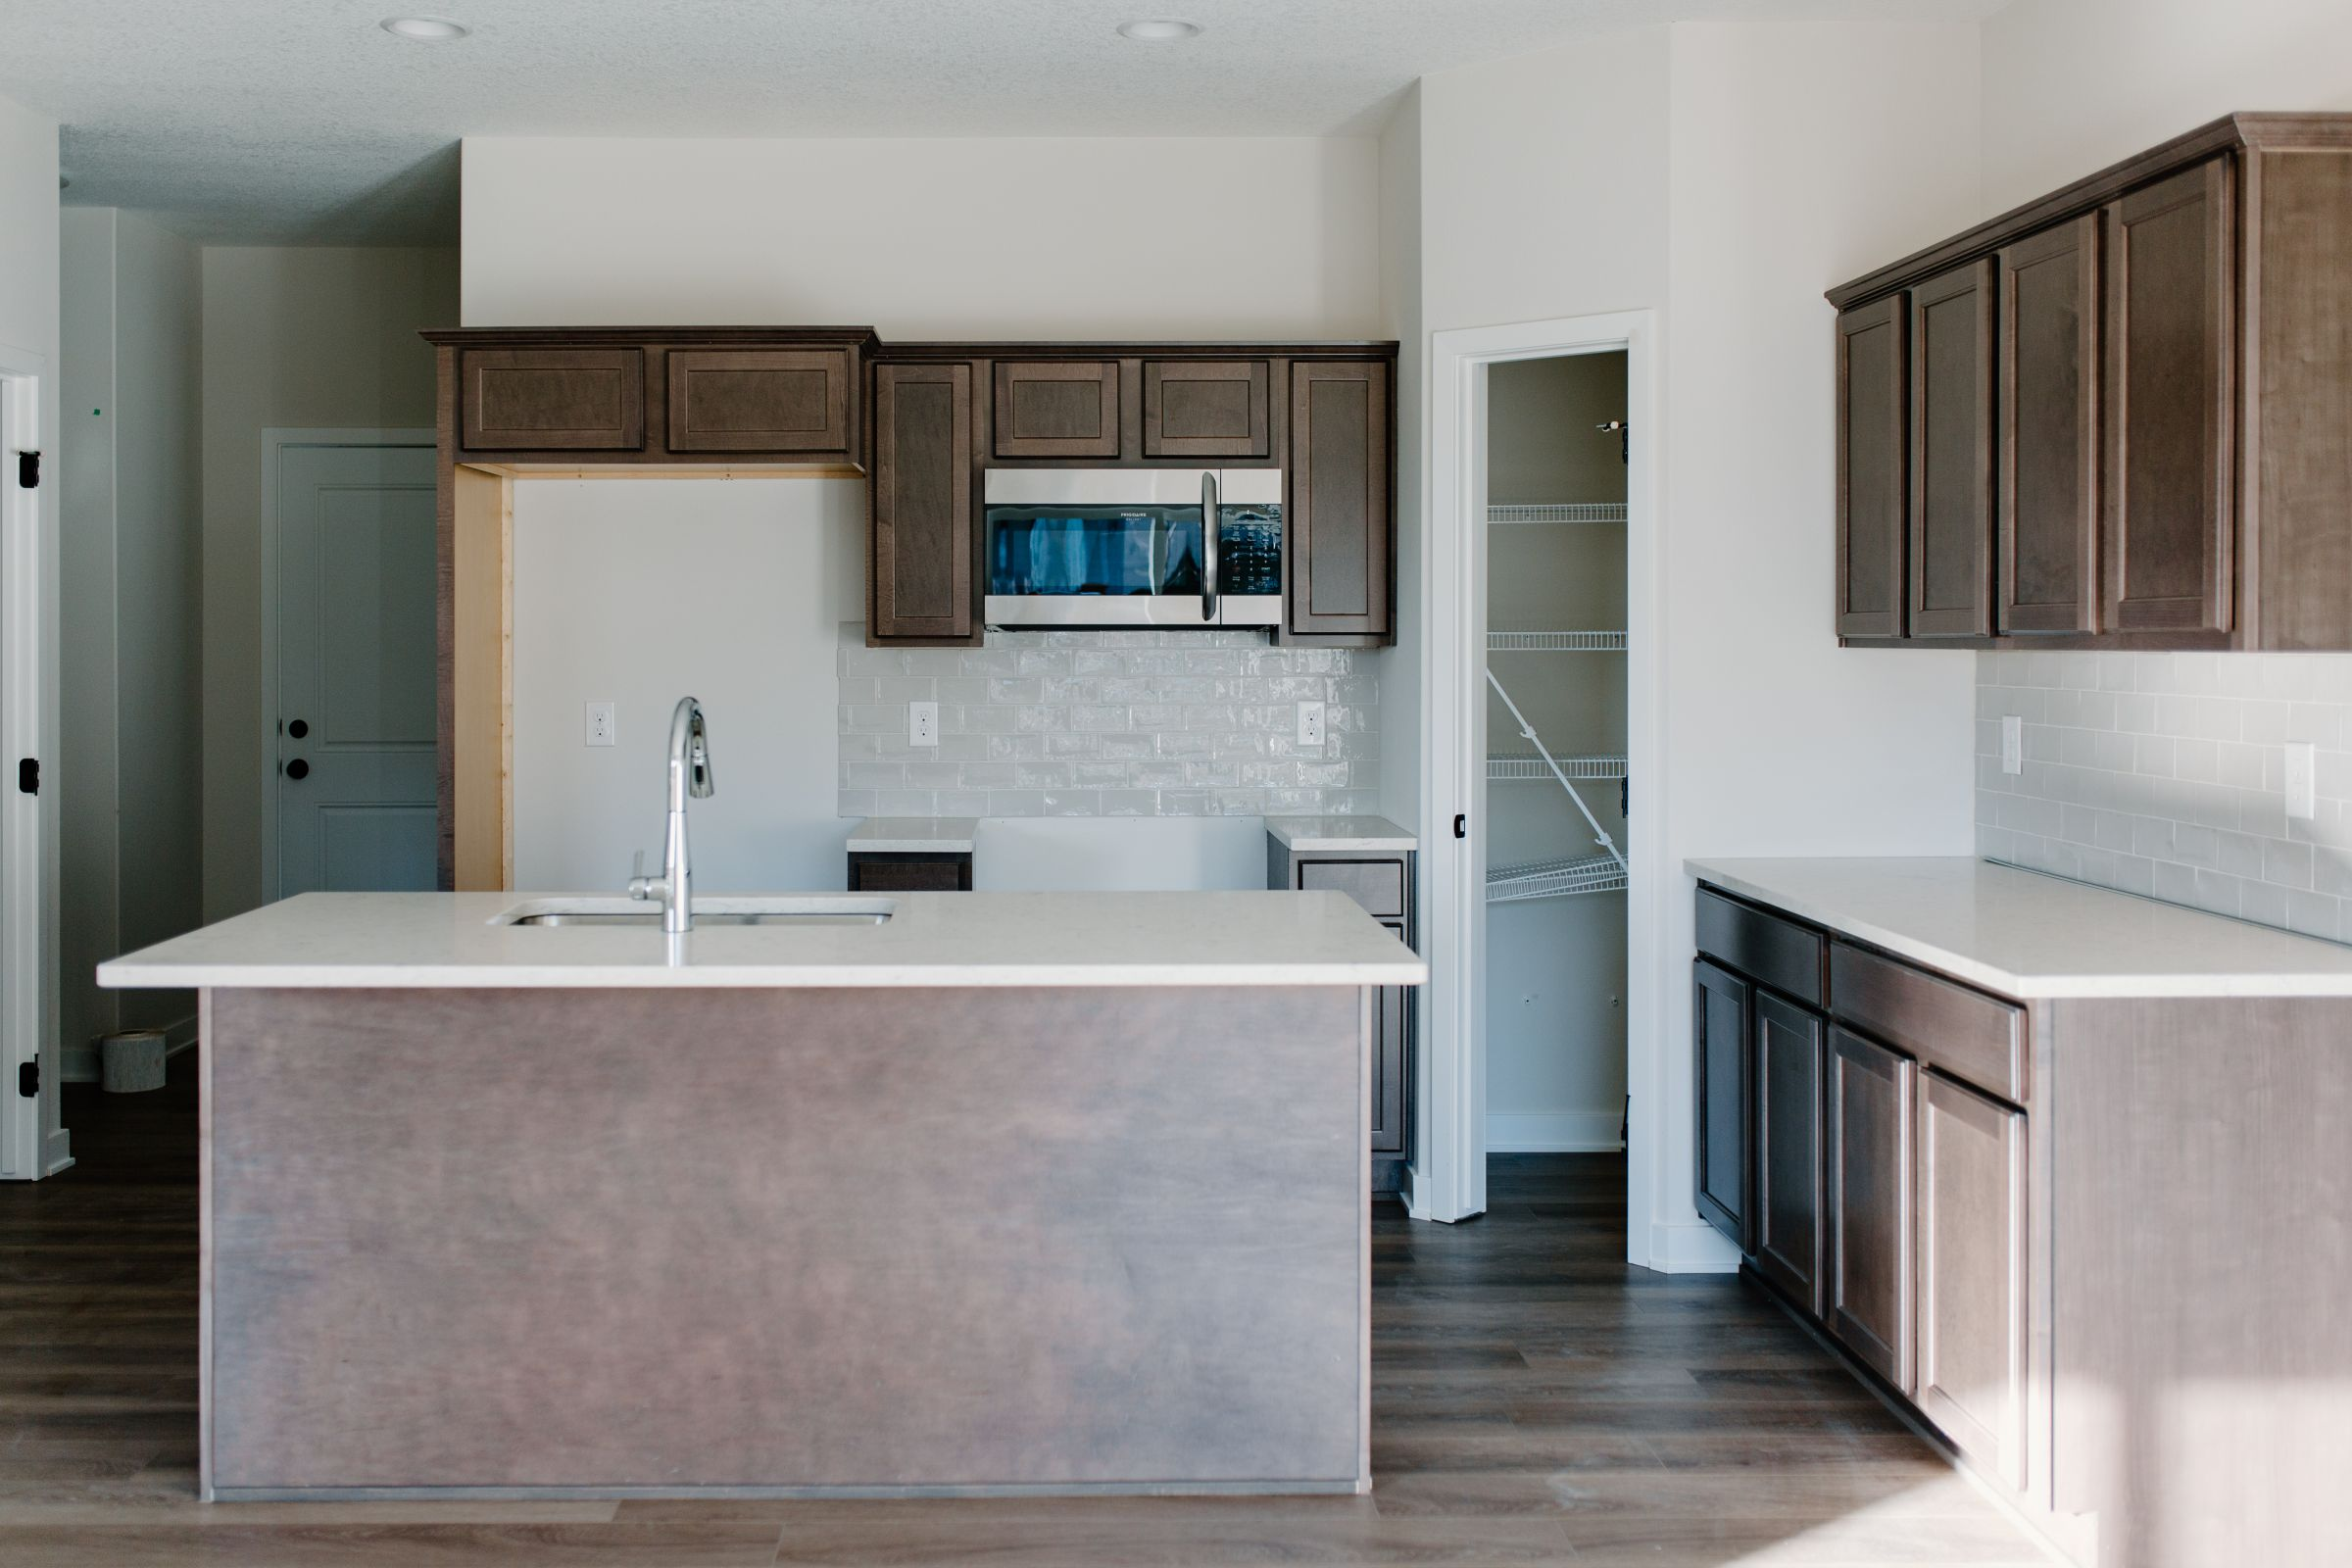 residential-warren-county-iowa-0-acres-listing-number-15140-3-2020-12-28-165452.jpg